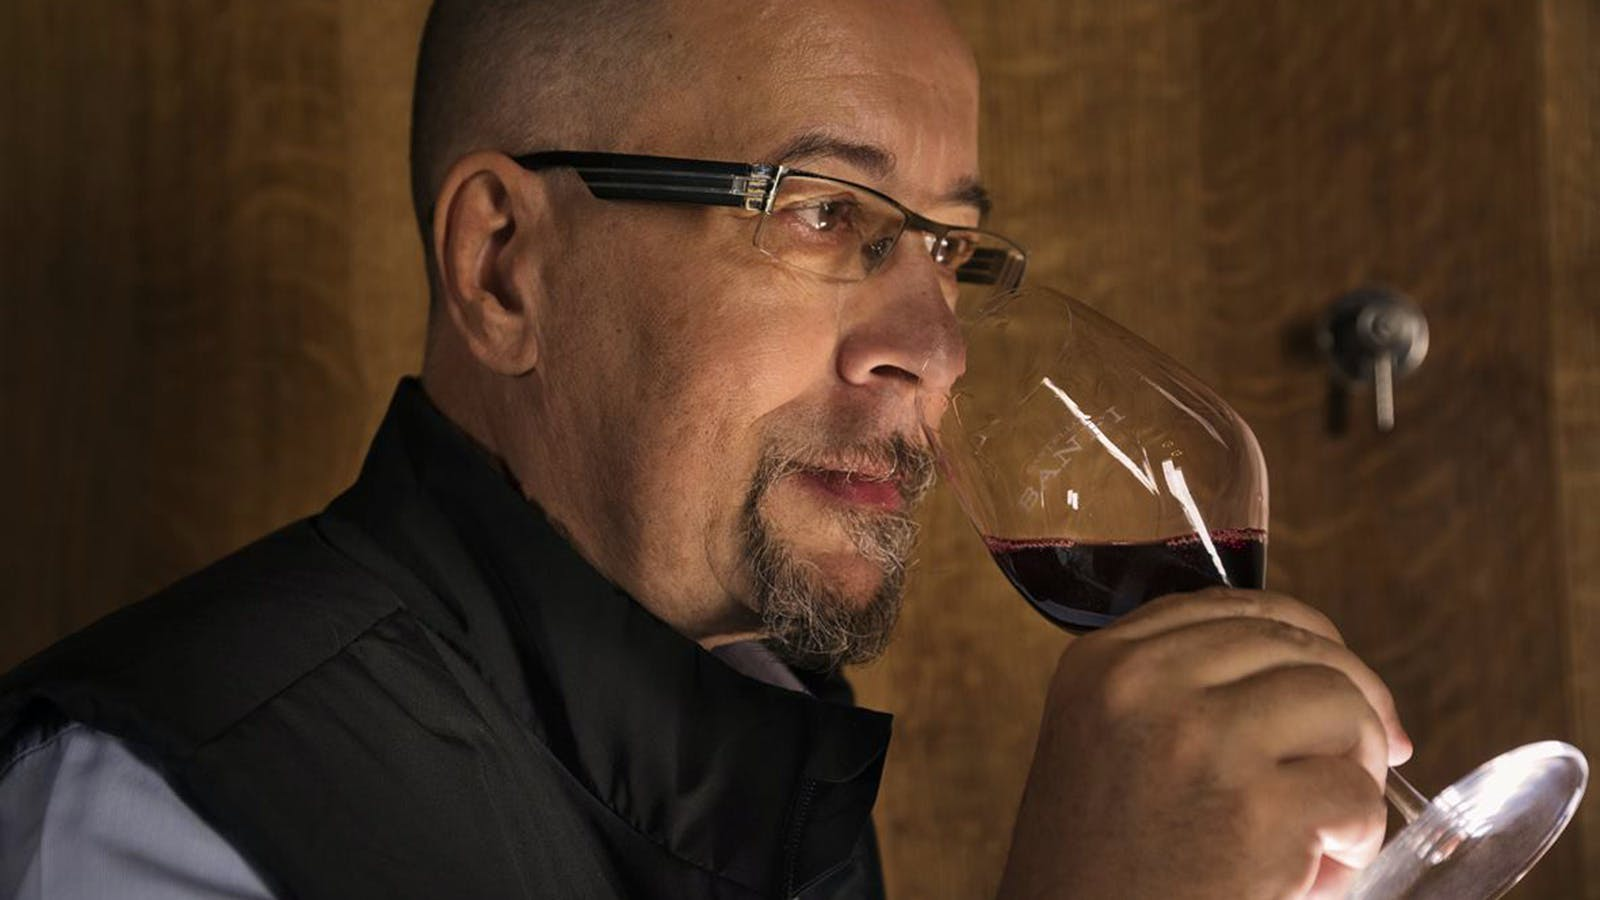 Rudy Buratti, Castello Banfi Winemaker, Dies at 56